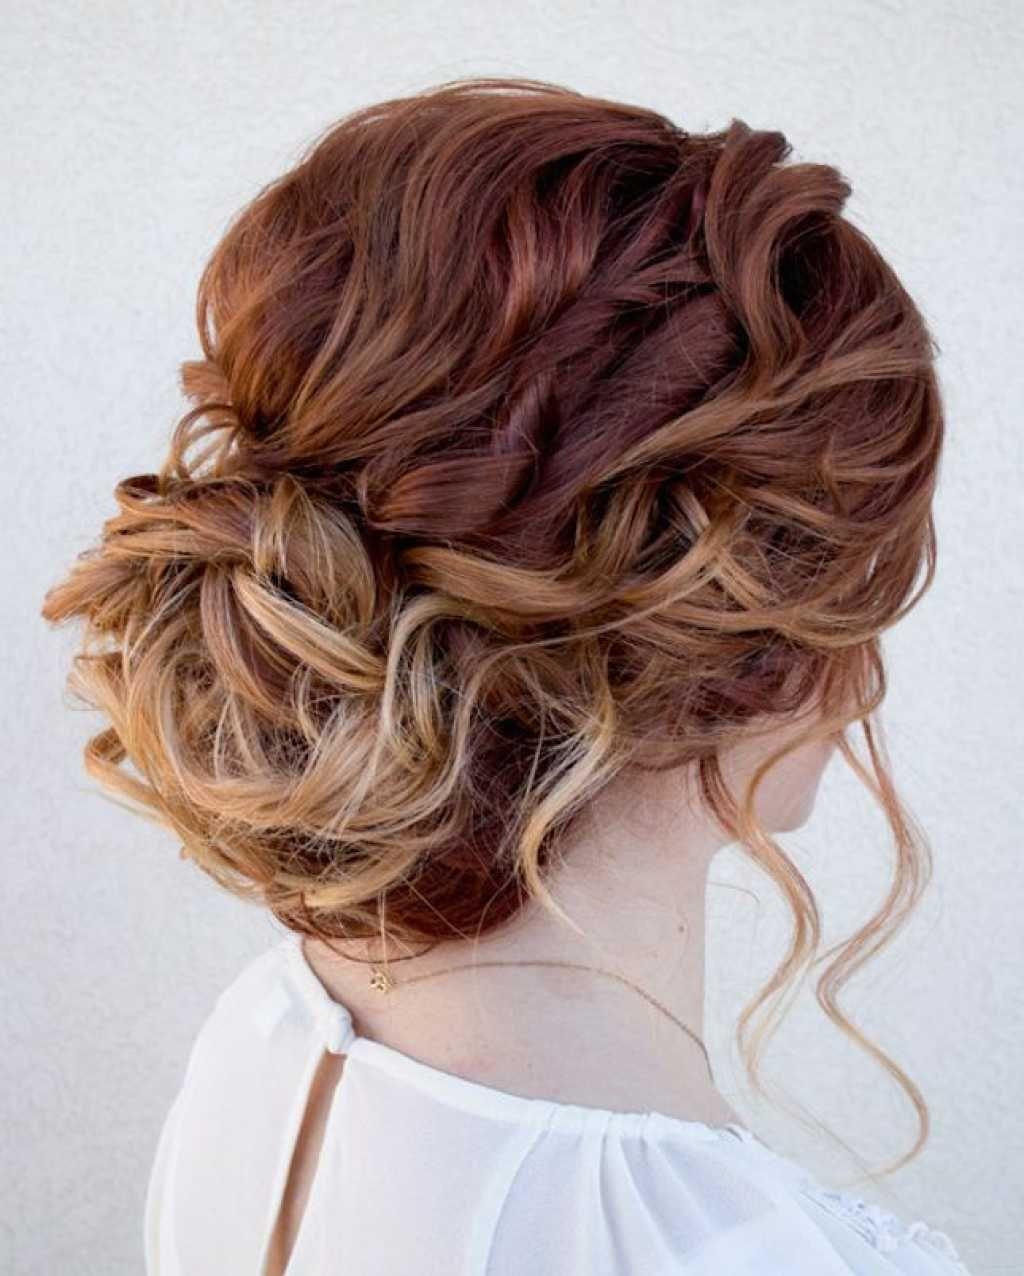 Elegant holiday hairdo onelady hair hairs hairstyle